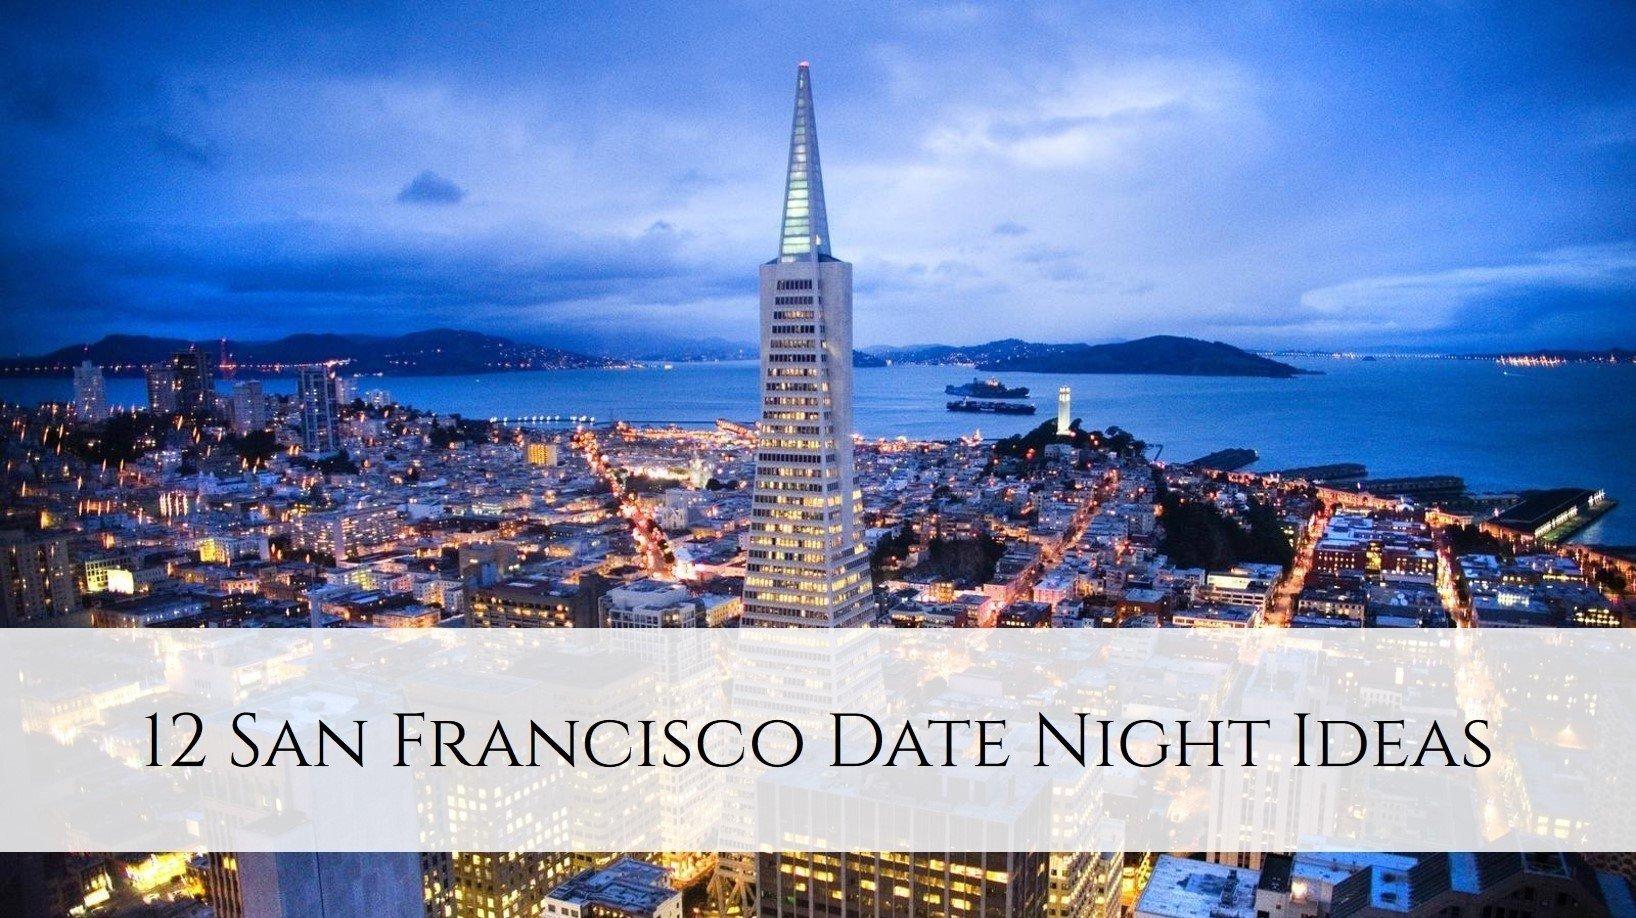 10 Stunning Date Ideas In San Francisco 12 san francisco date night ideas enclosed 2020